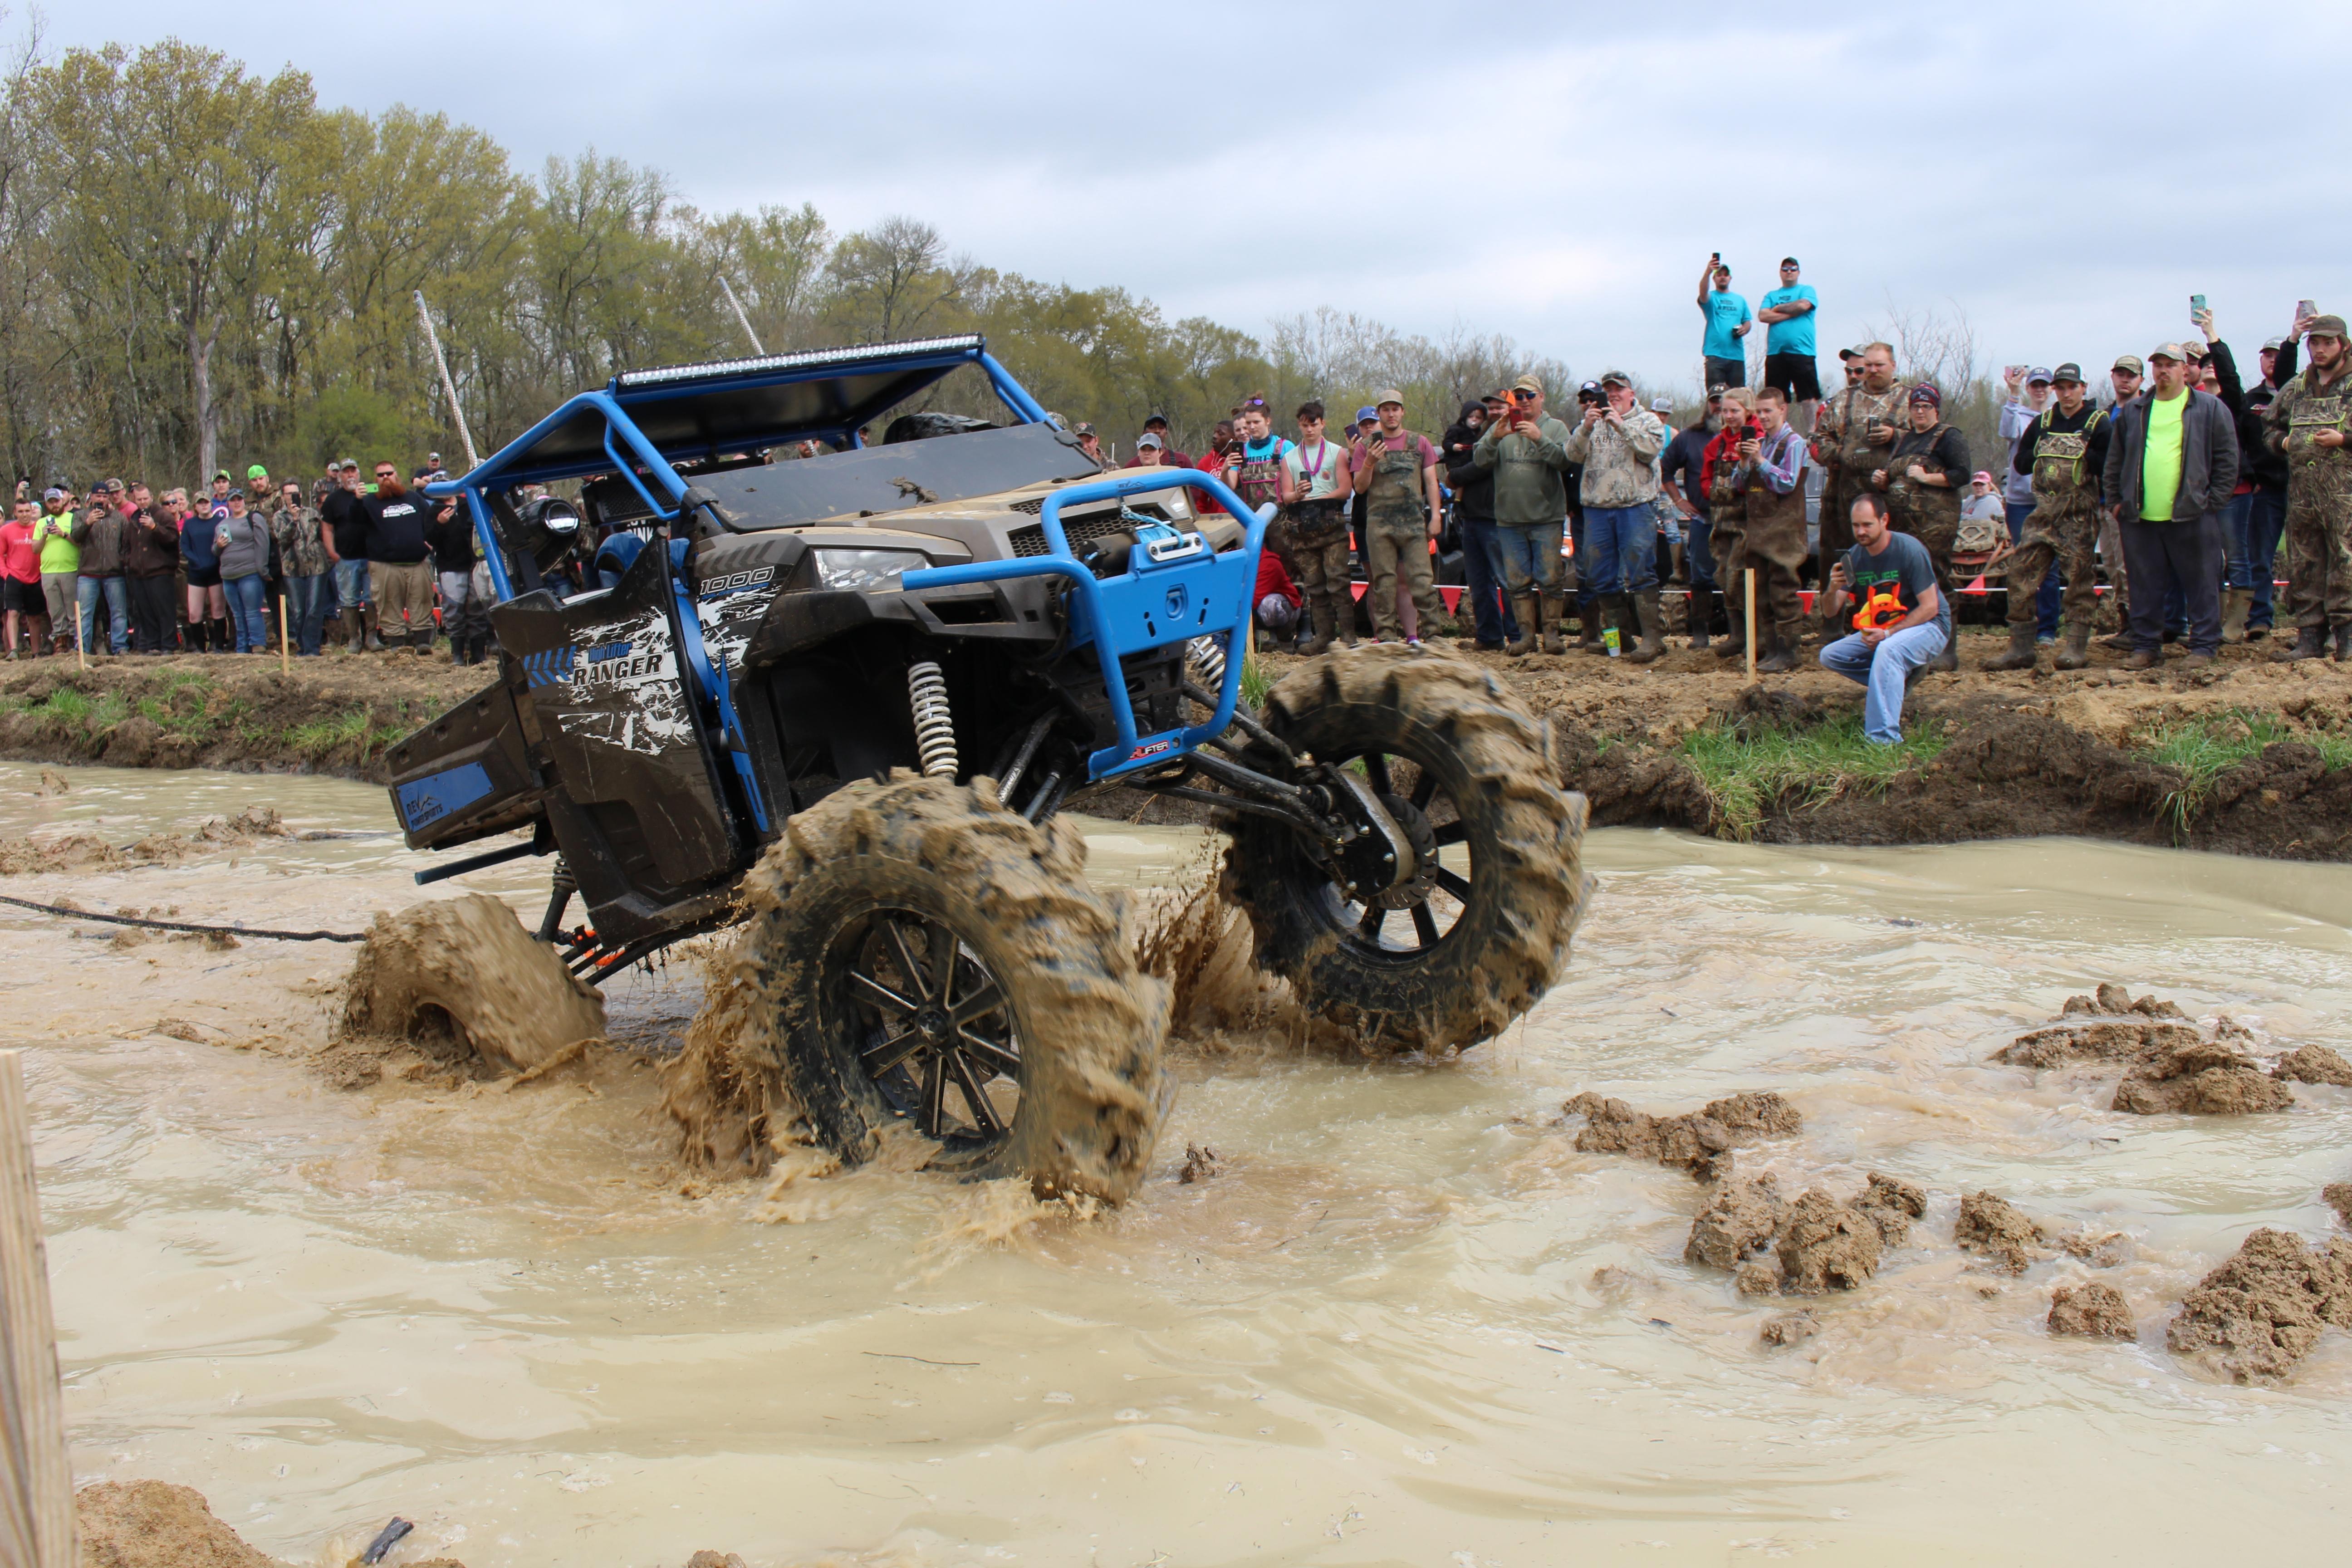 2019 High Lifter Mud Nationals